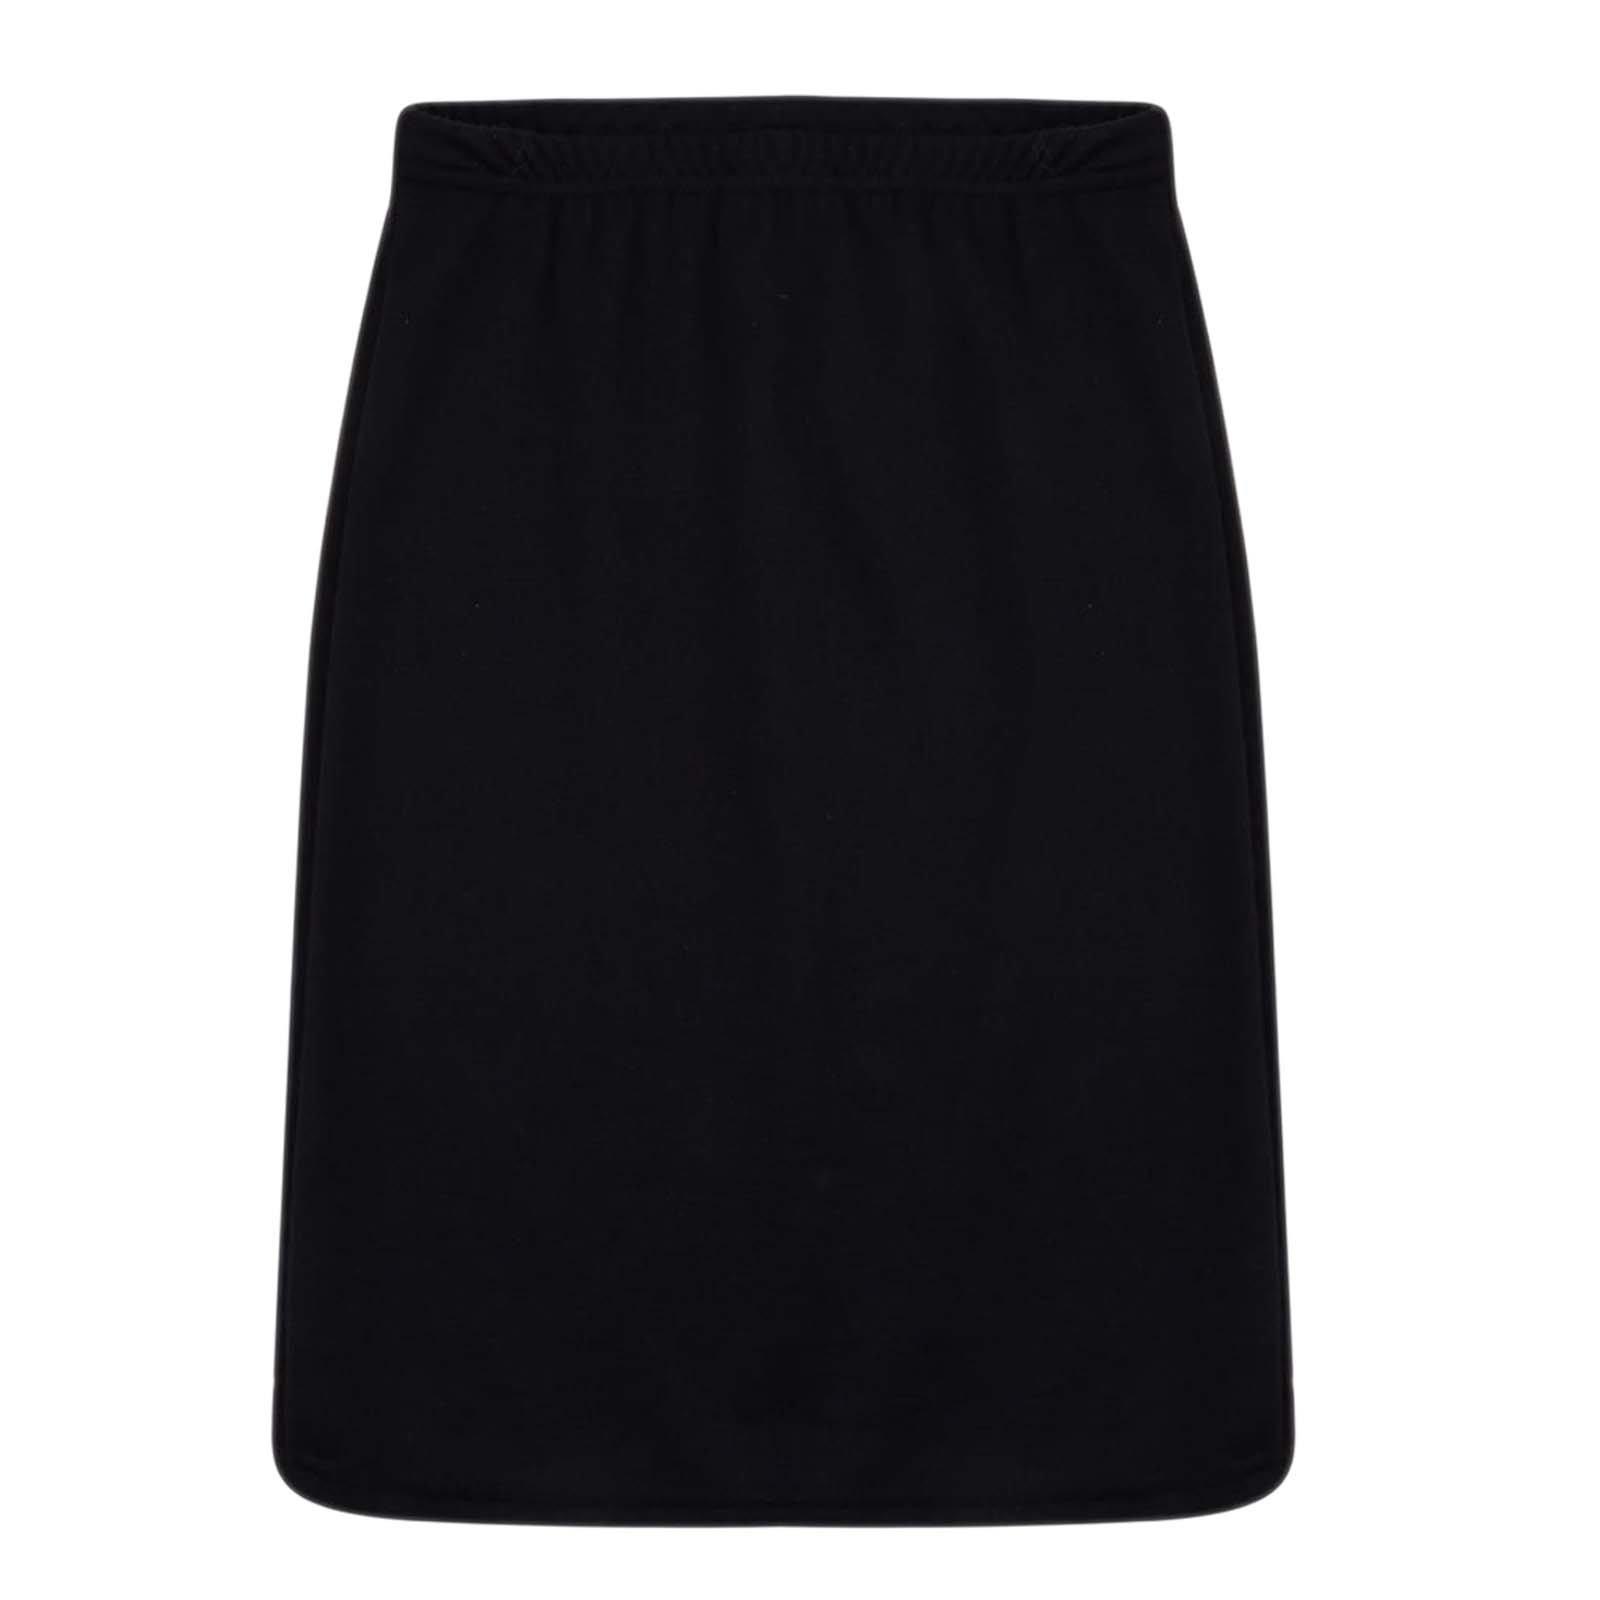 New Girls Skater Skirts School Fashion Summer Plain Skirt 5 6 7 8 9 10 11 12 13Y